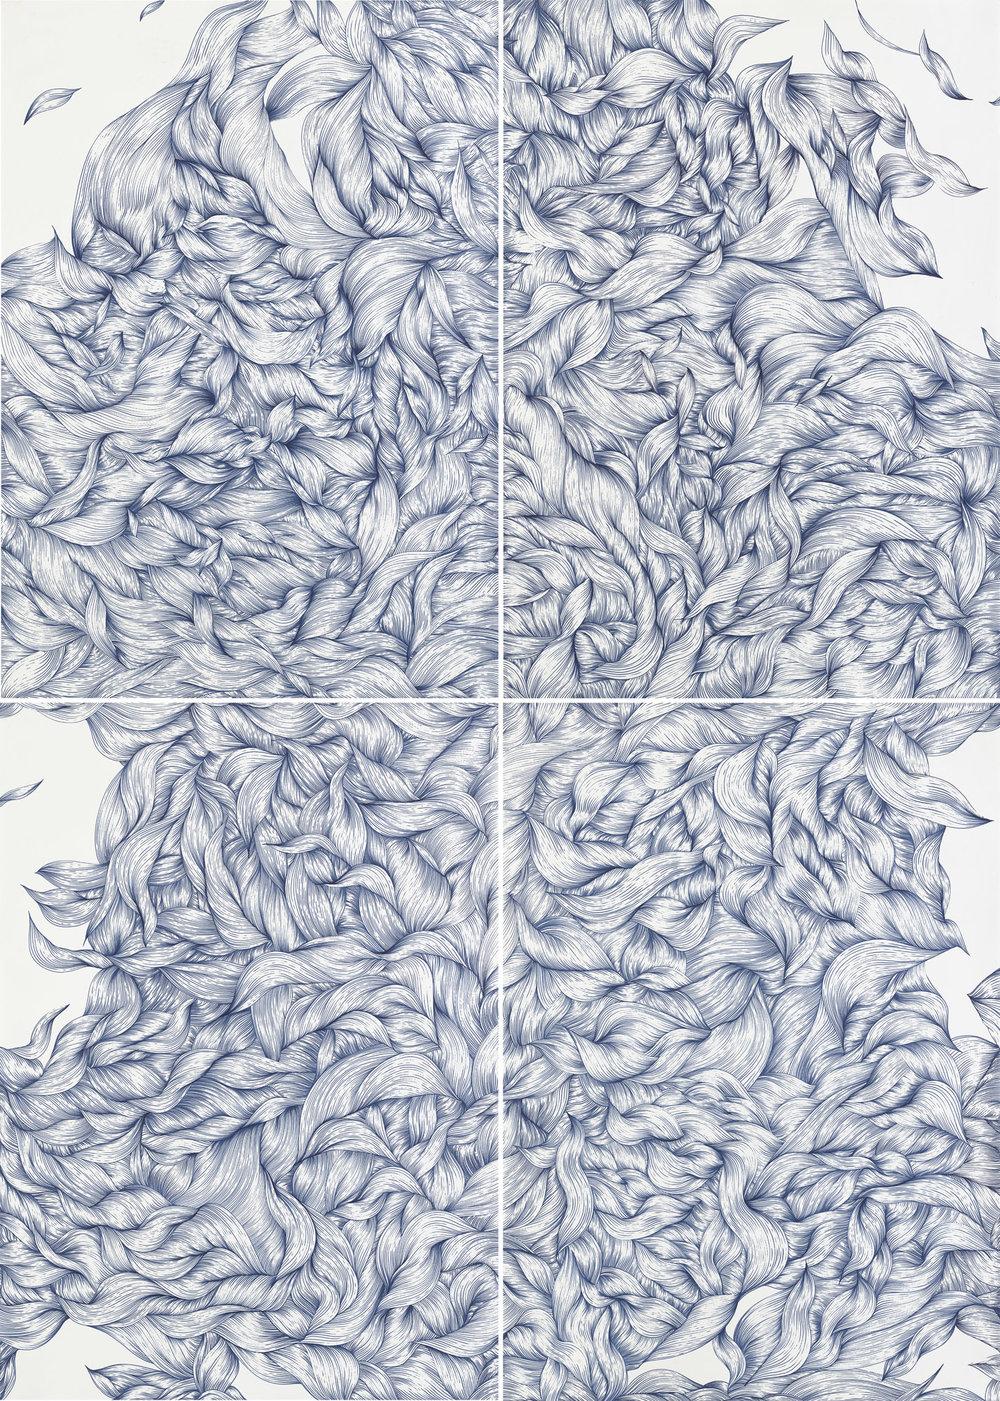 BK P18207 | UNTITLED | 280 X 200CM | BLUE INK ON PAPER | 2017